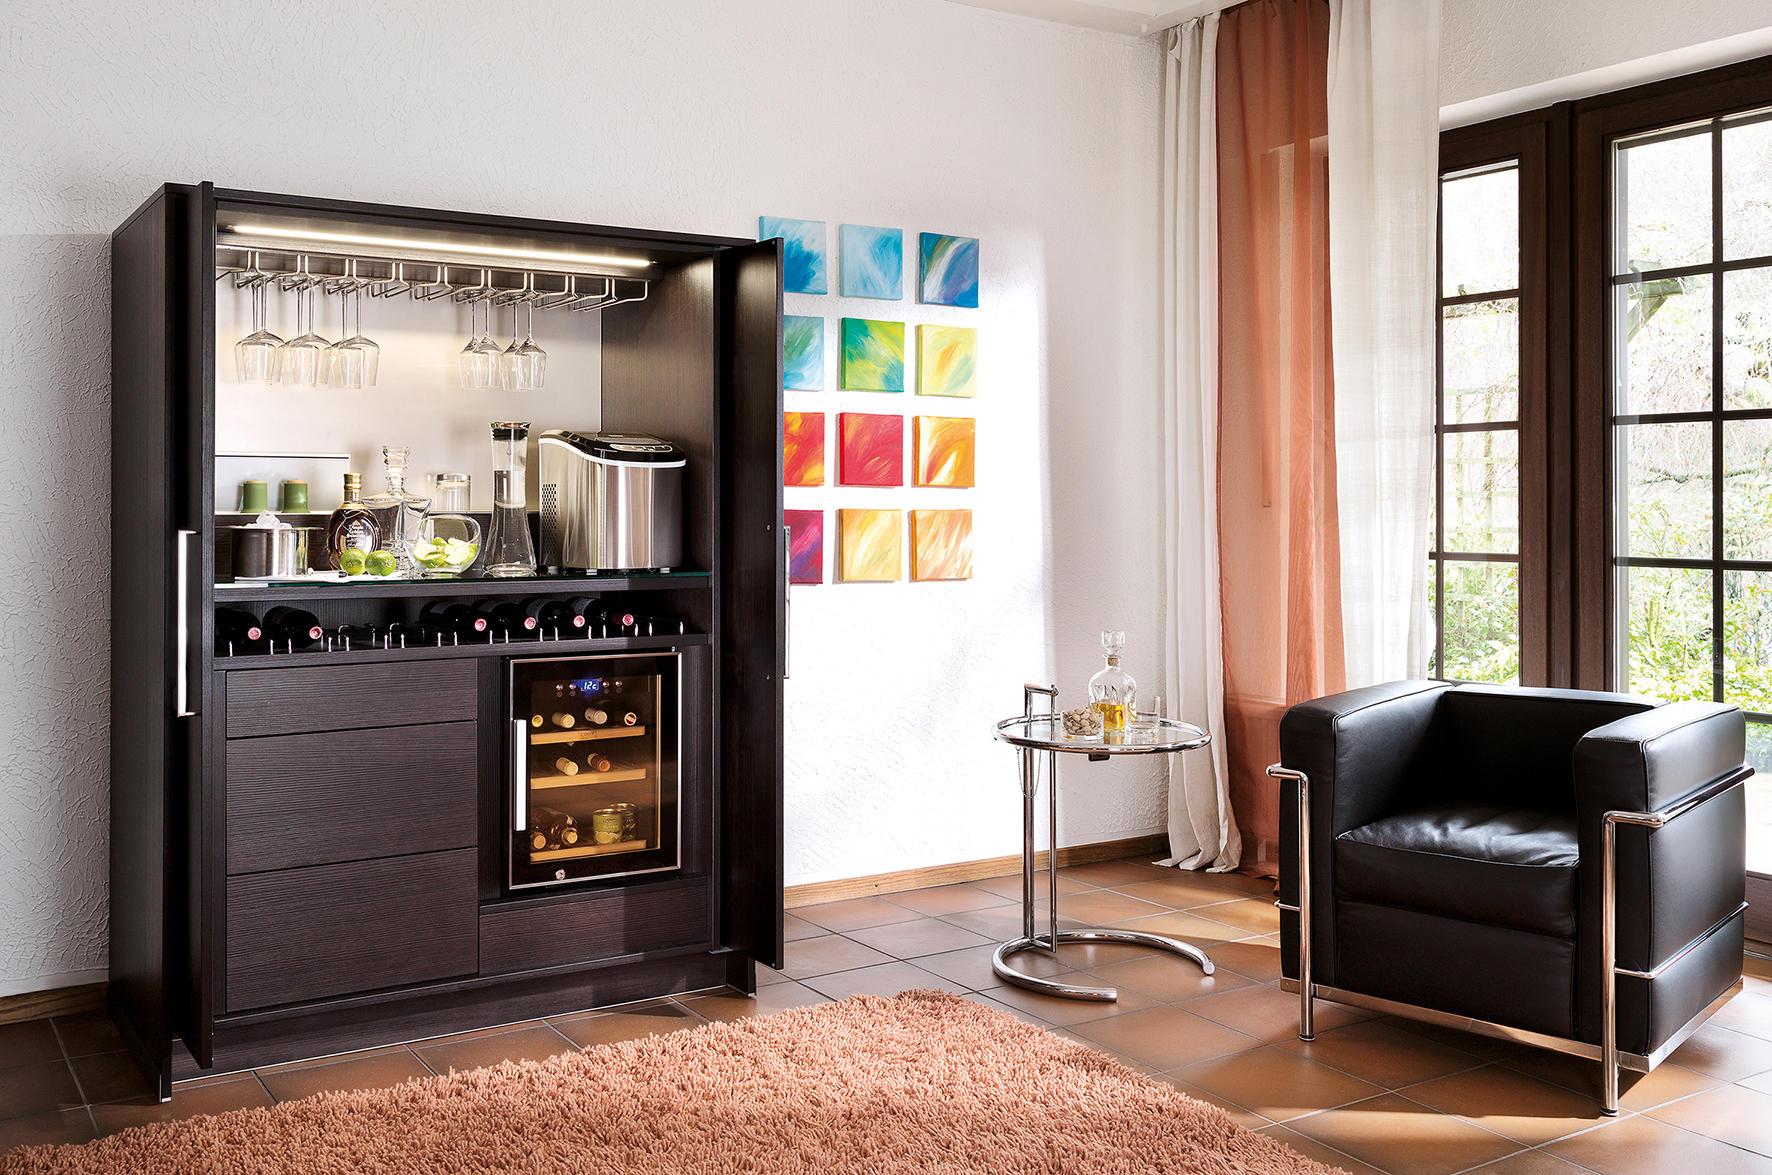 STAGE BAR - Barschränke / Hausbars von Poggenpohl | Architonic